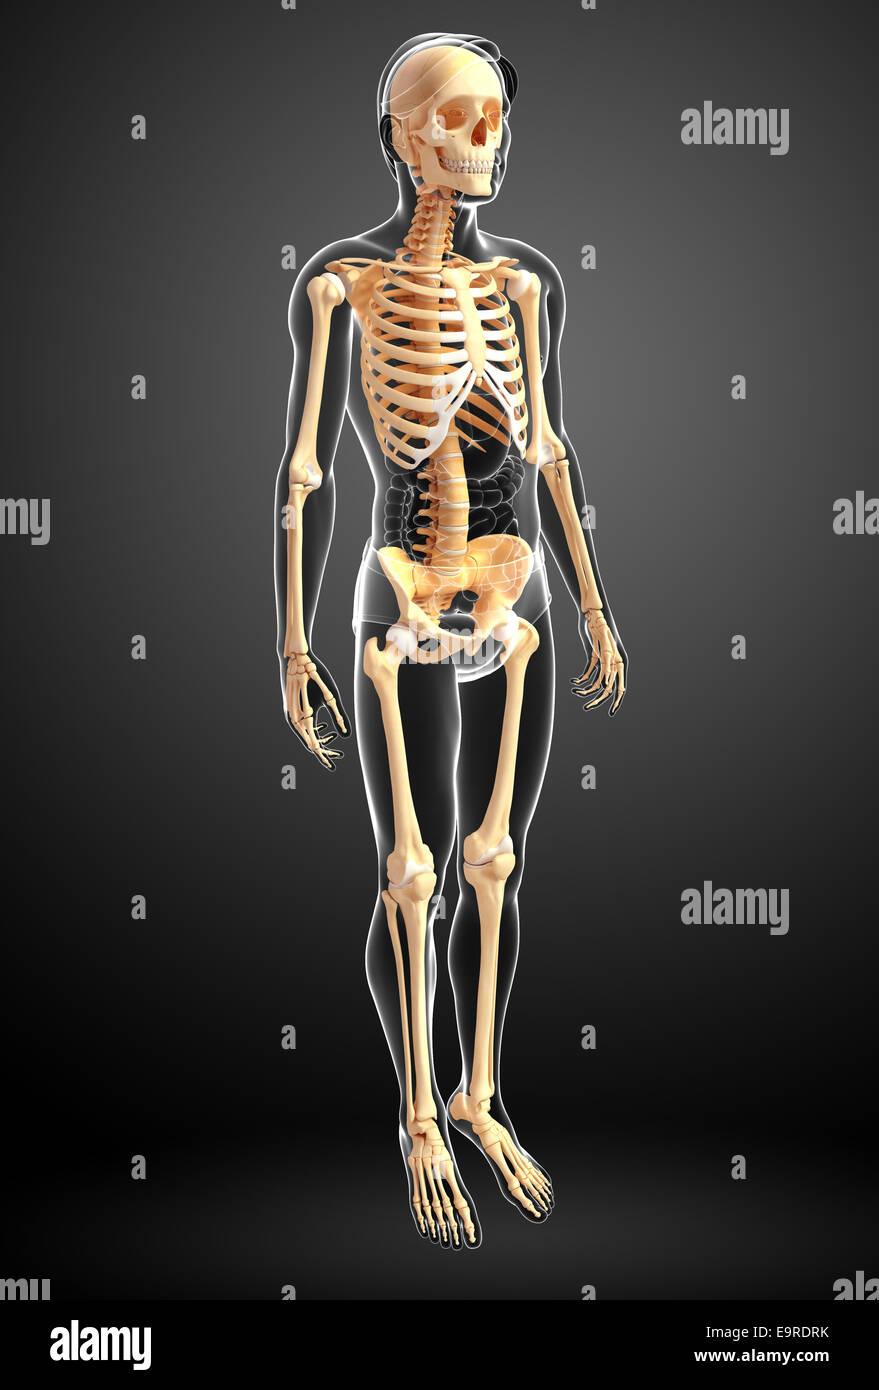 Illustration Of Human Skeleton Side View Stock Photo 74889127 Alamy